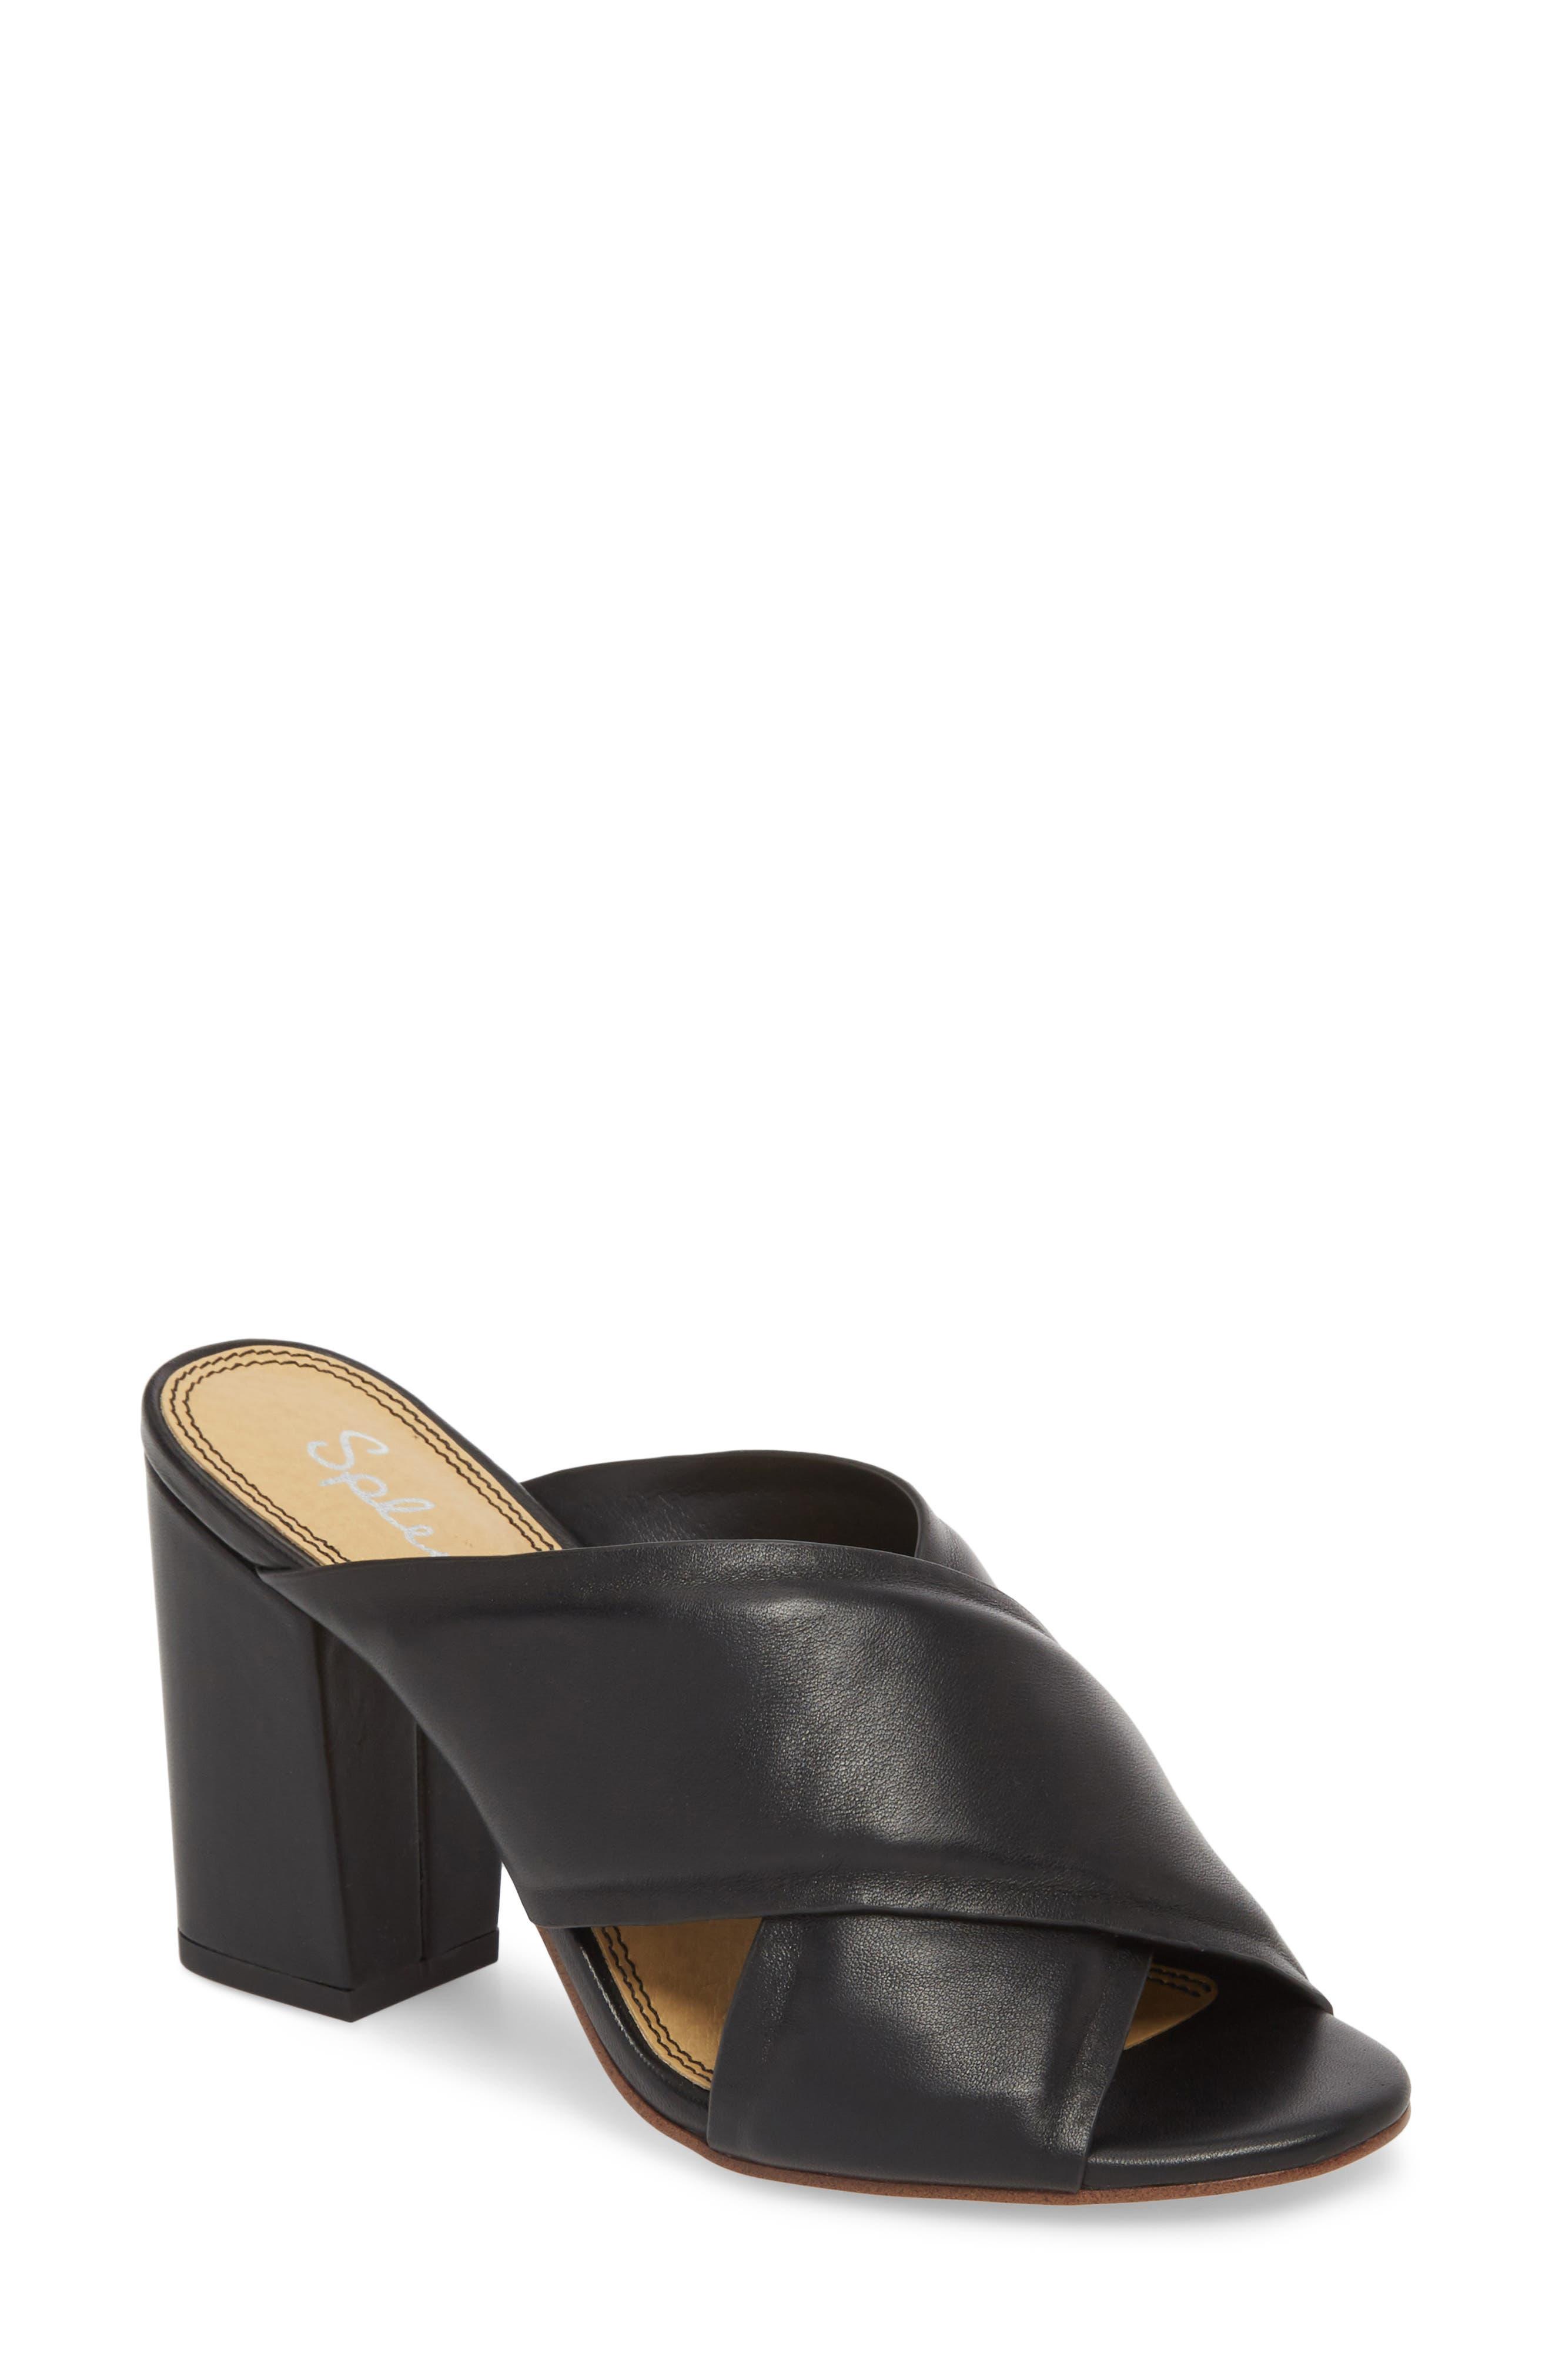 Norris Sandal,                         Main,                         color, BLACK LEATHER